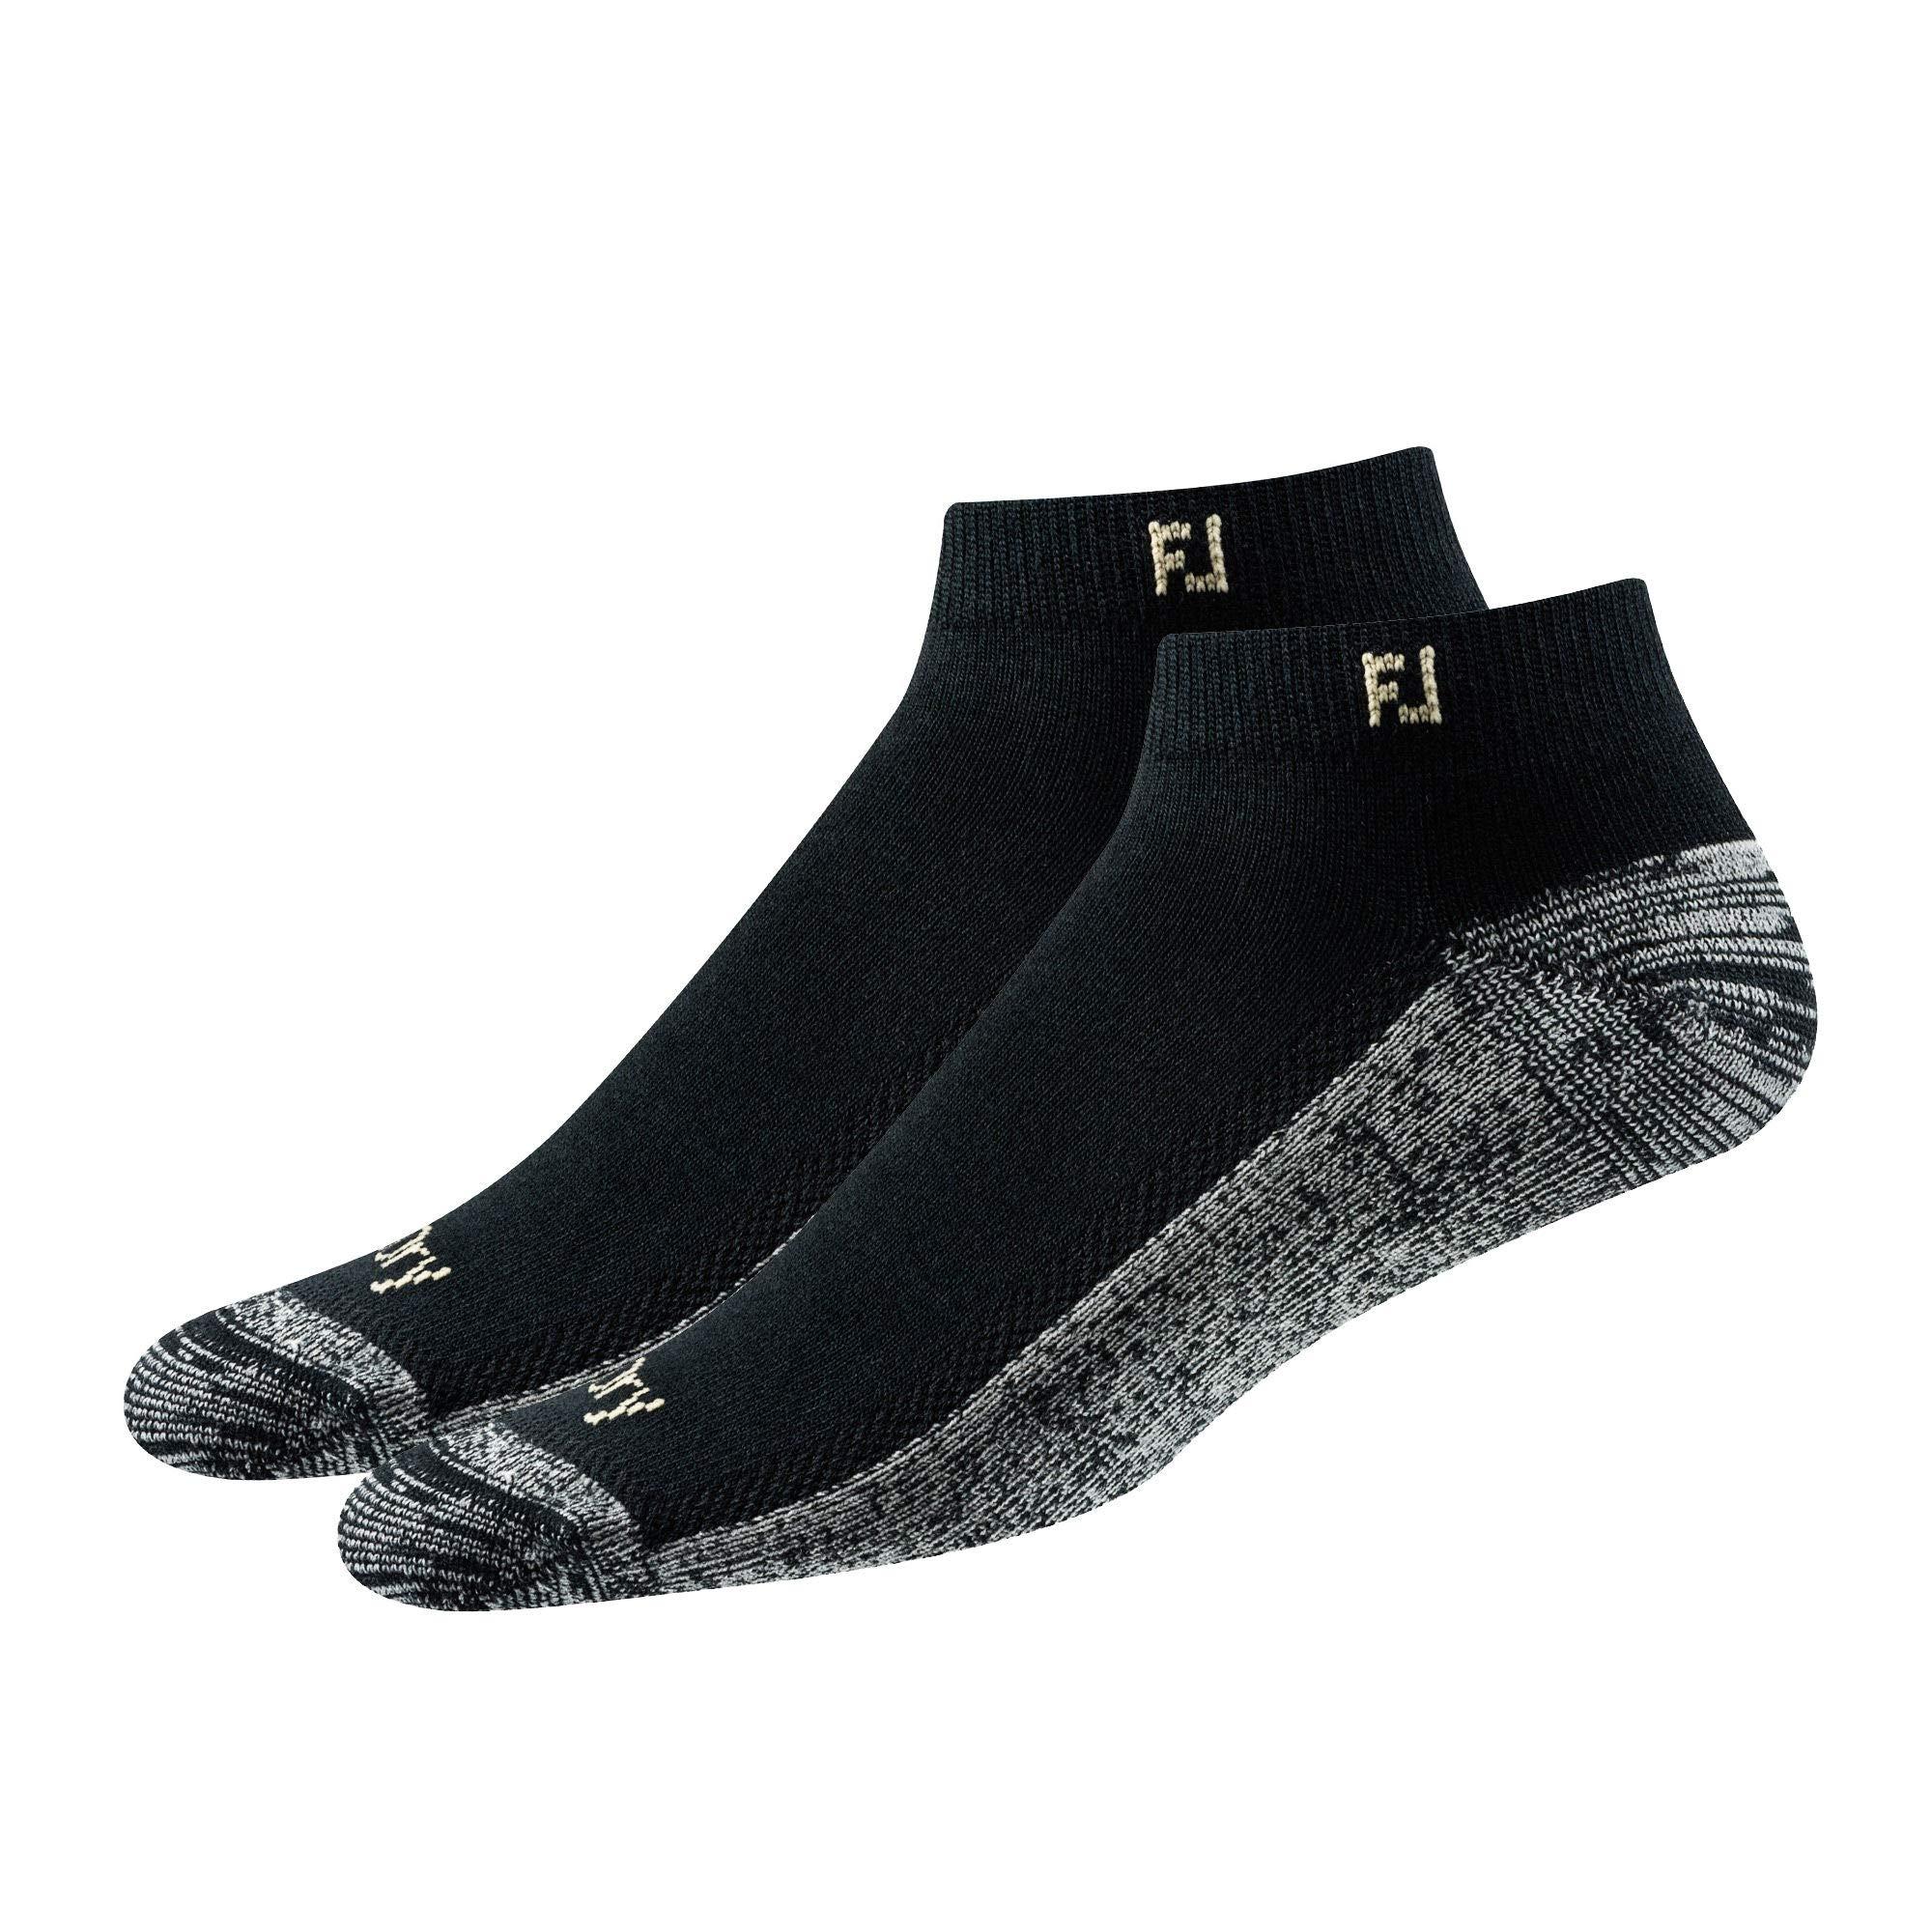 FootJoy ProDry Sport Socks 2 Pack